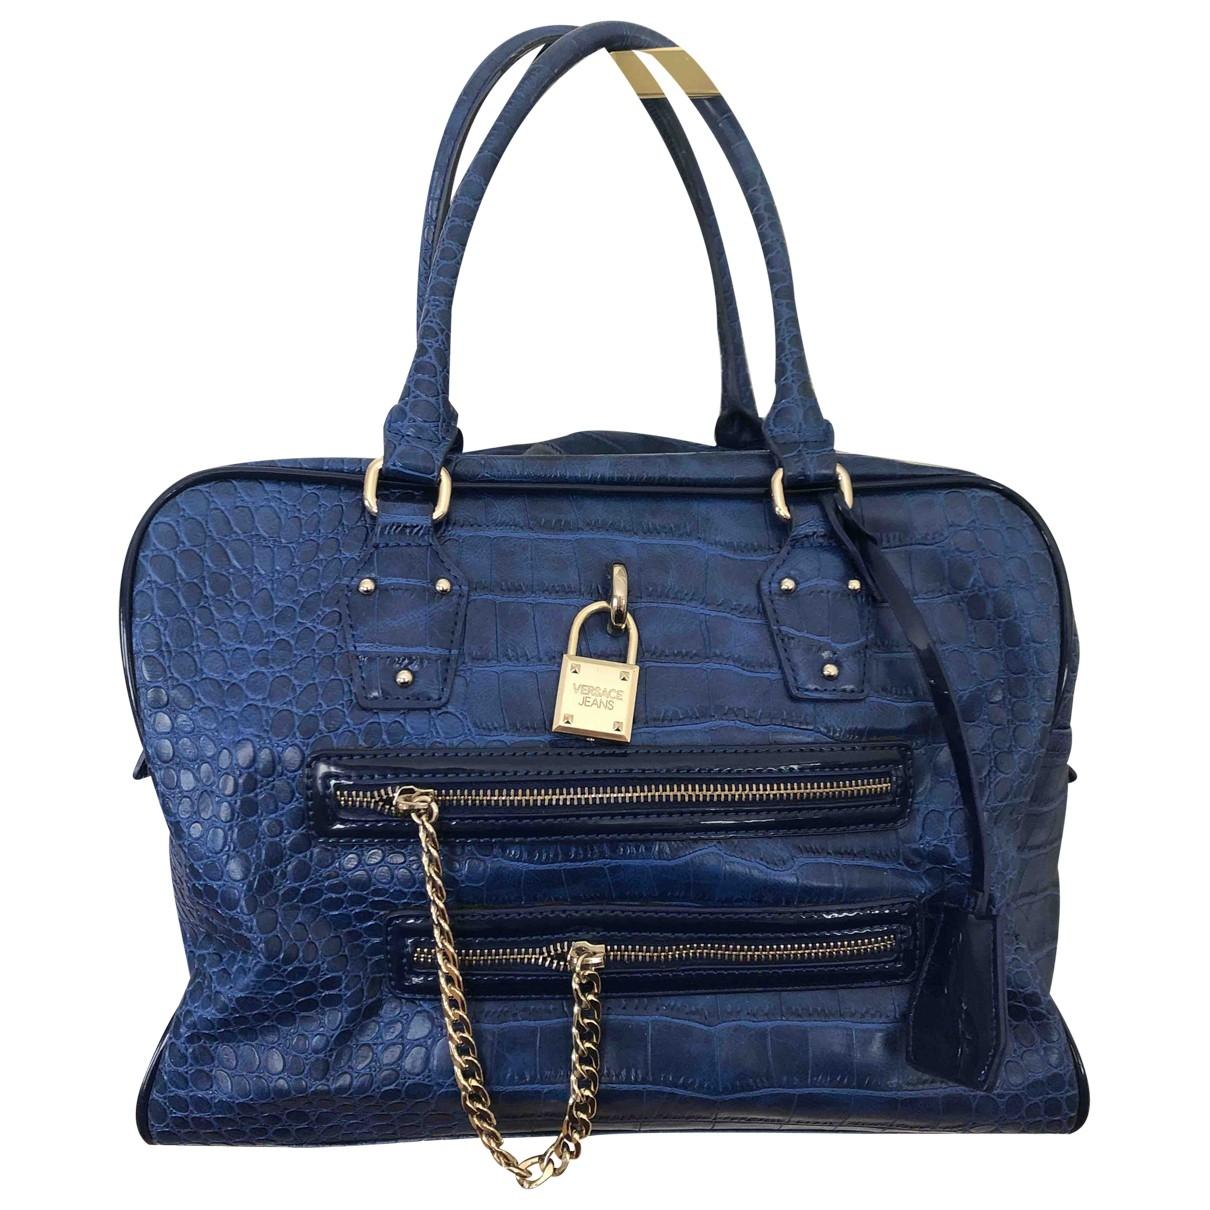 Versace Jean - Sac a main   pour femme - bleu